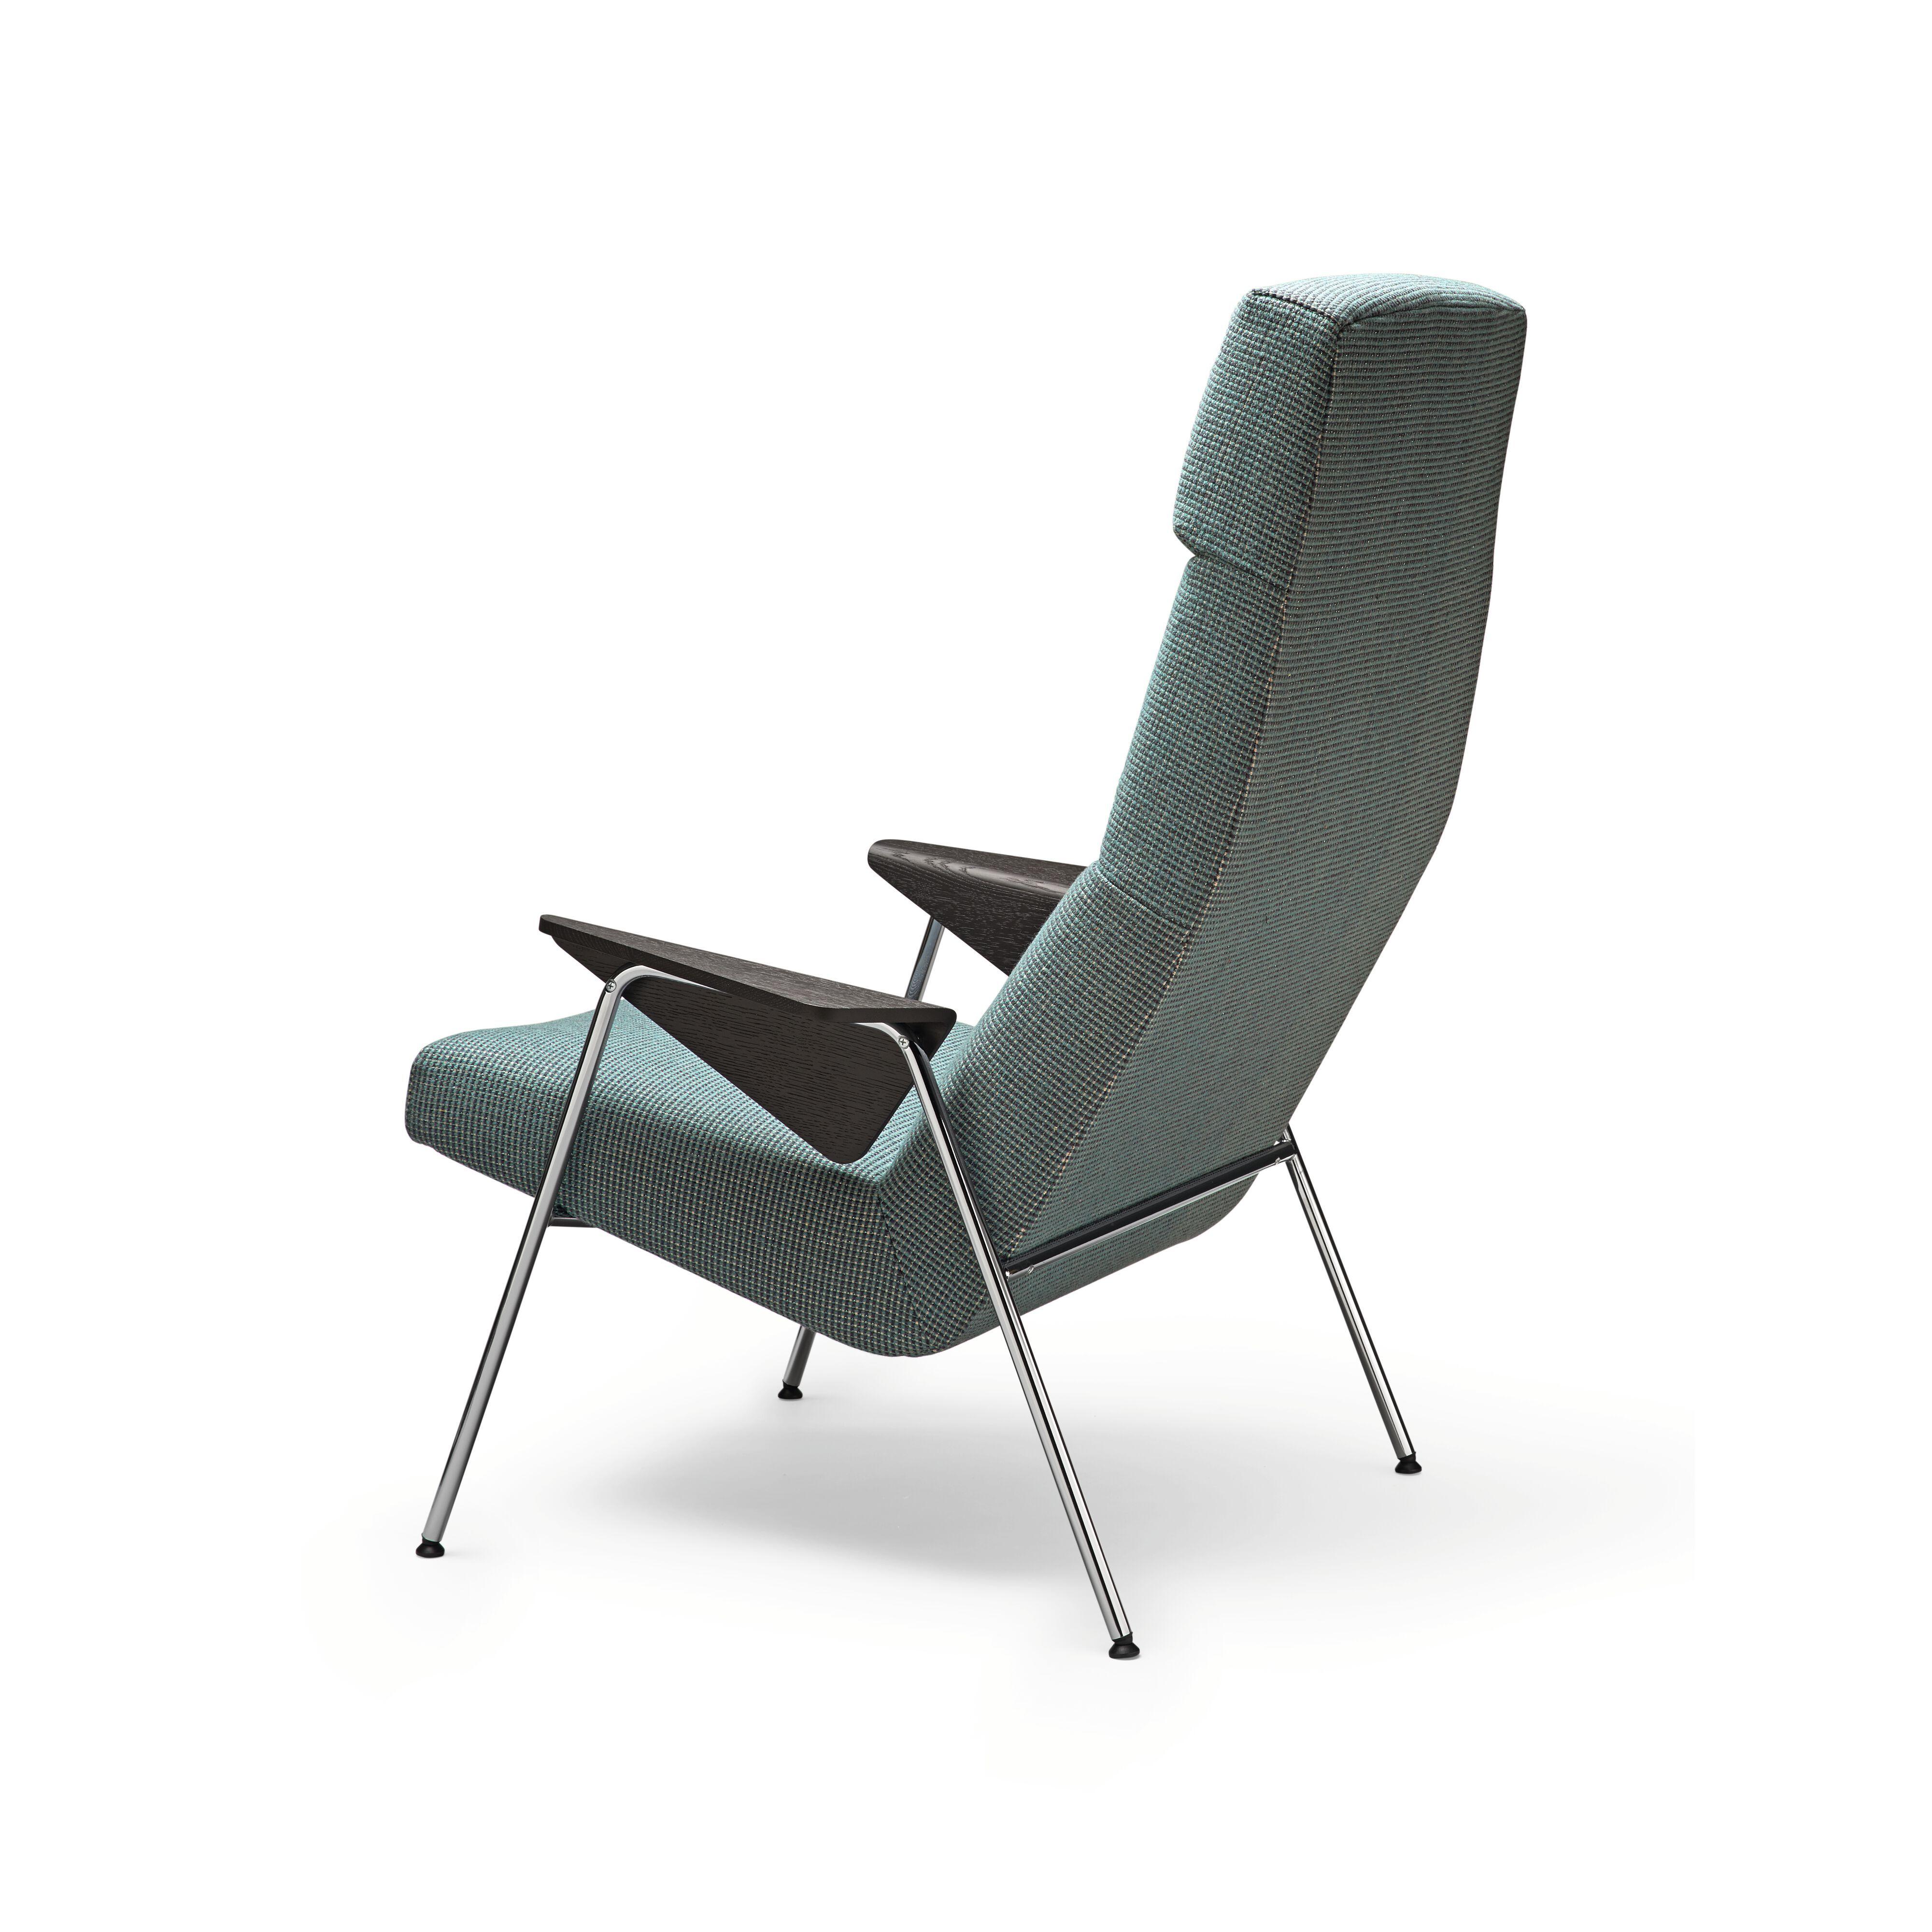 03-WK-Classic_Edition-Votteler_Chair-0017-H.tif